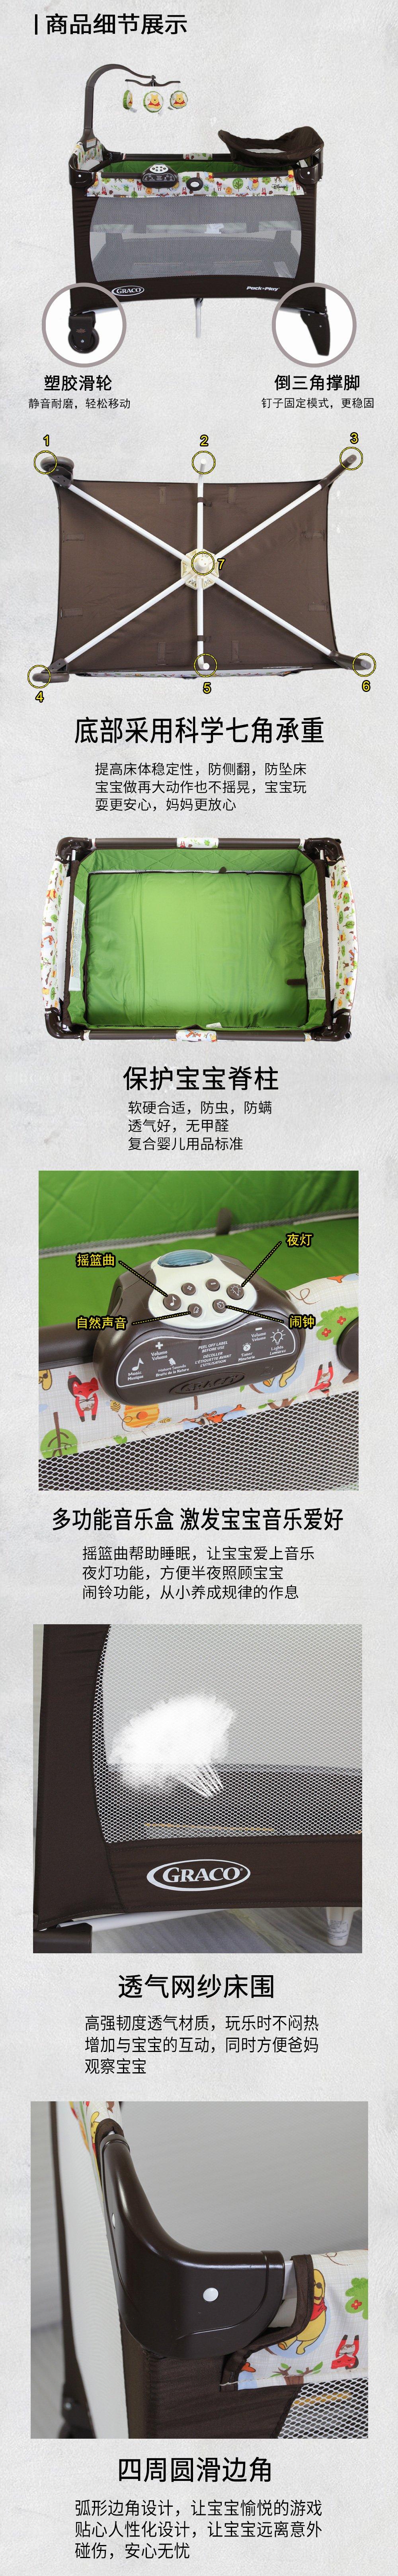 B072KQX9DF-5